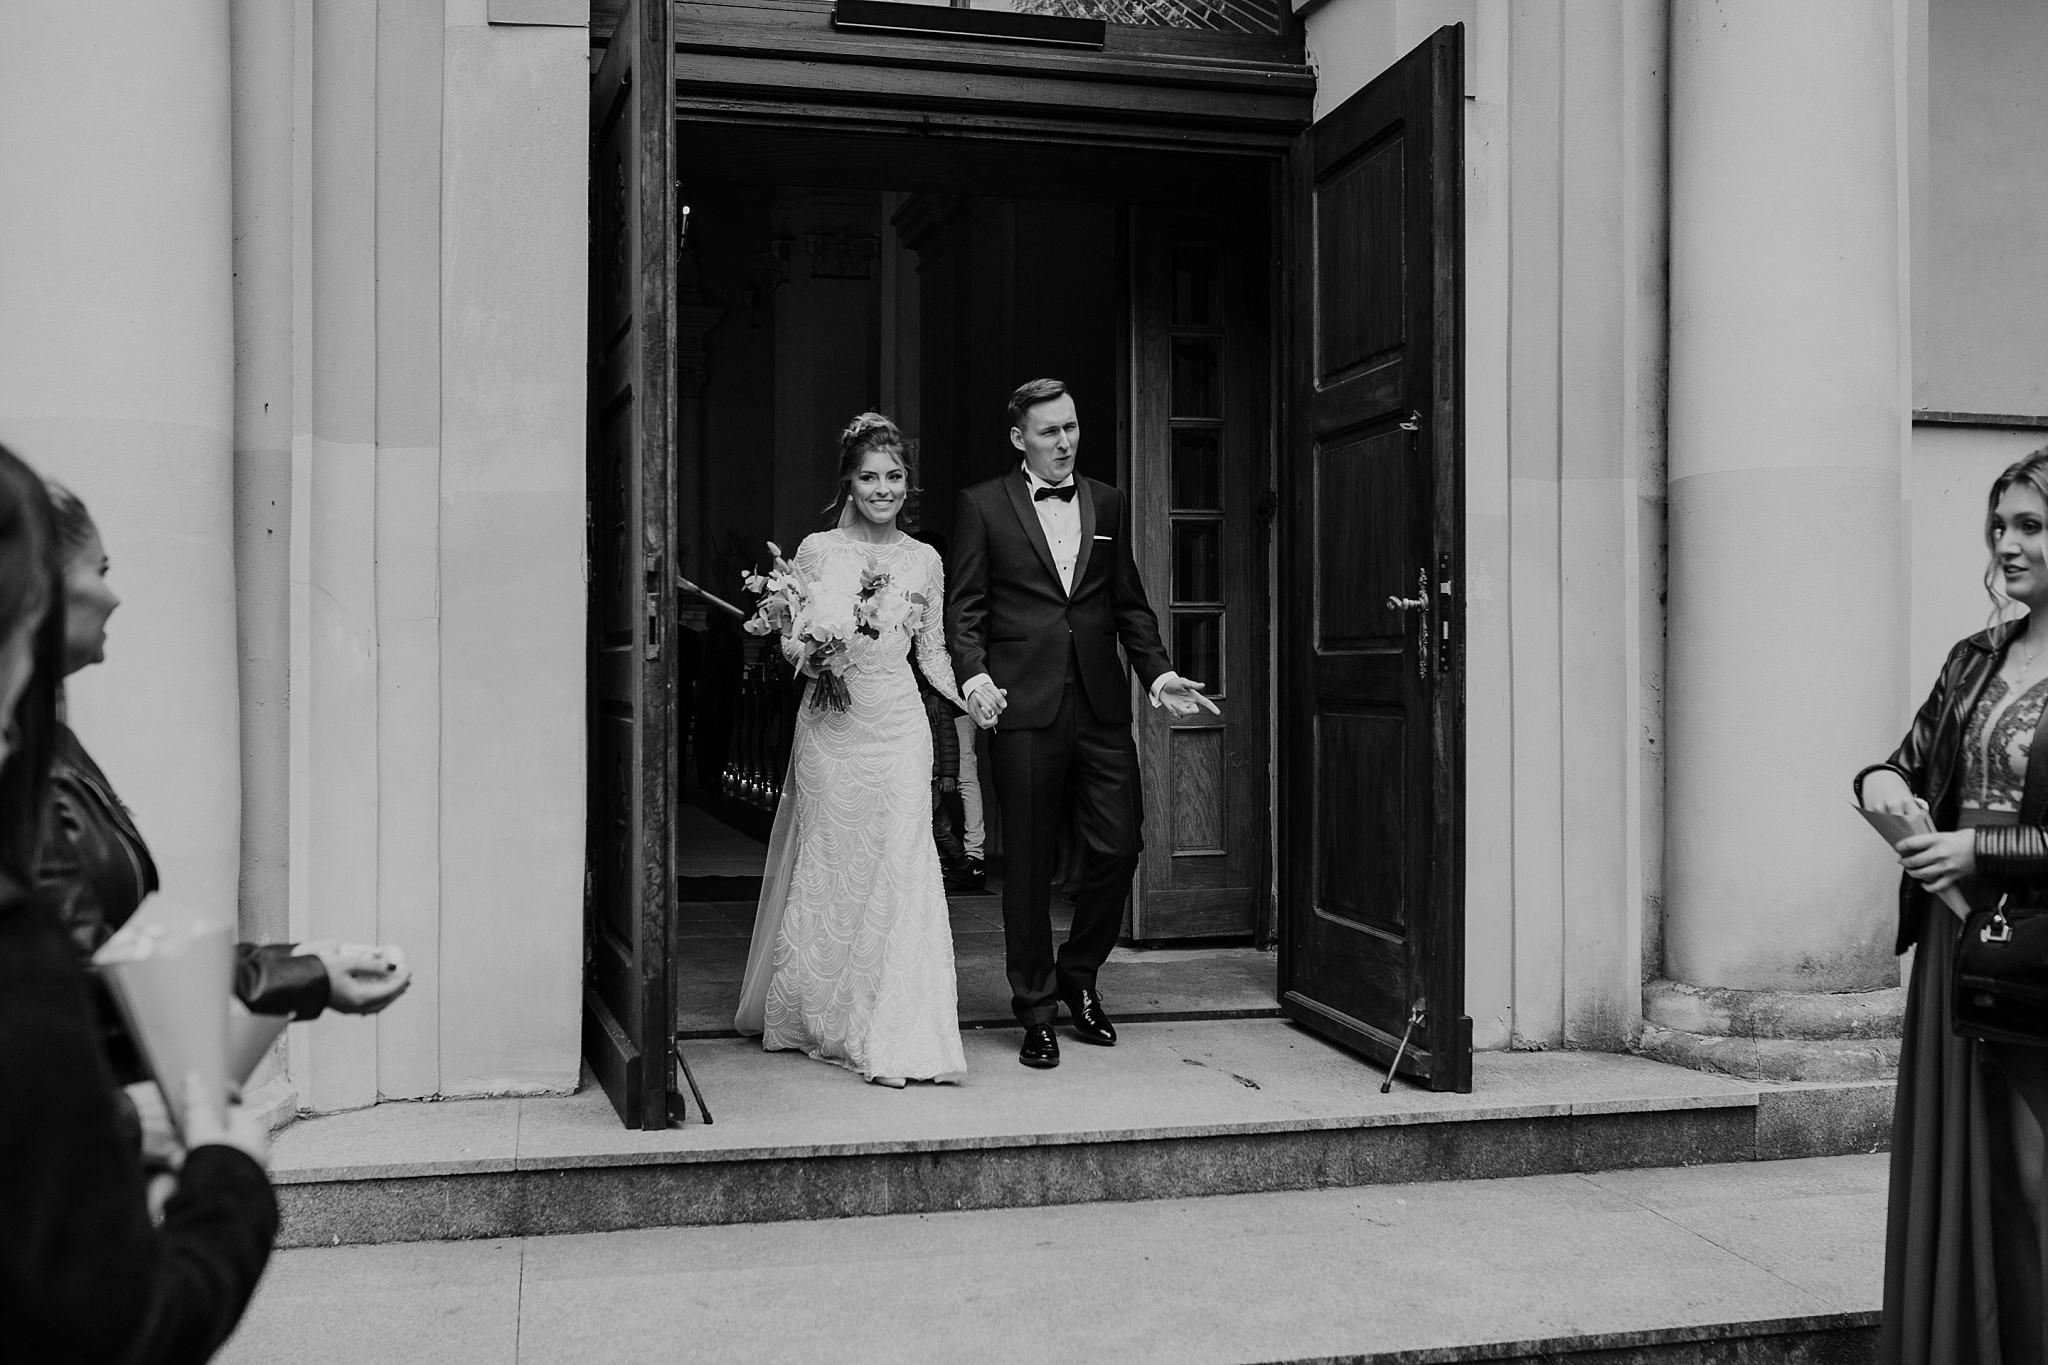 fotograf poznan wesele dobra truskawka piekne wesele pod poznaniem wesele w dobrej truskawce piekna para mloda slub marzen slub koronawirus slub listopad wesele koronawirus 214